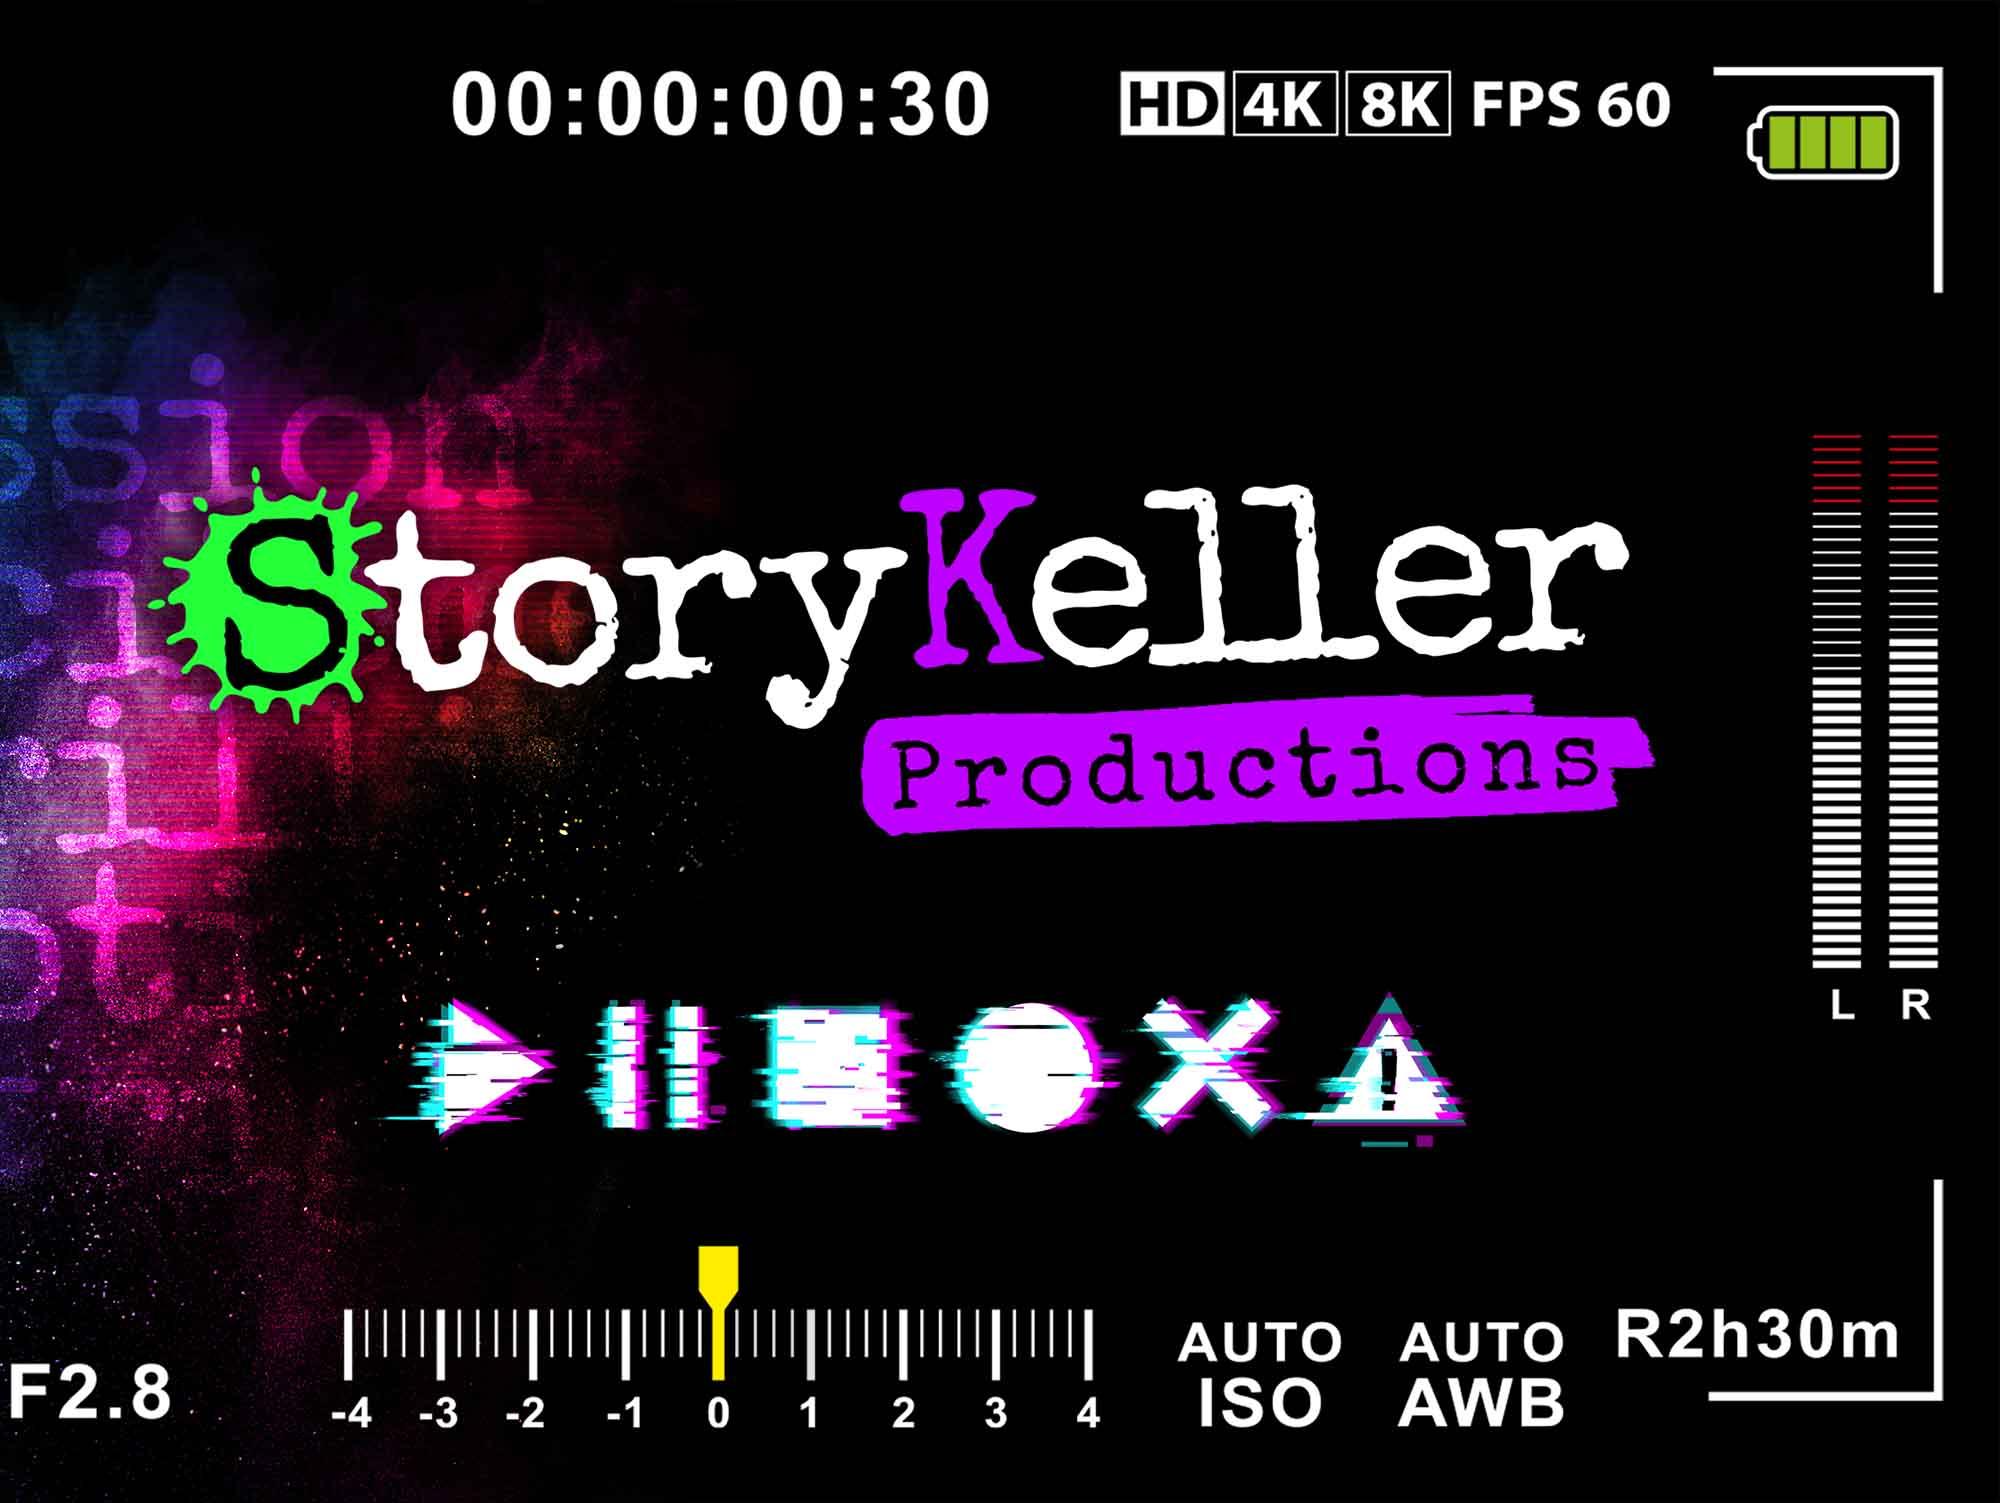 Logo design mockup Storykeller Productions